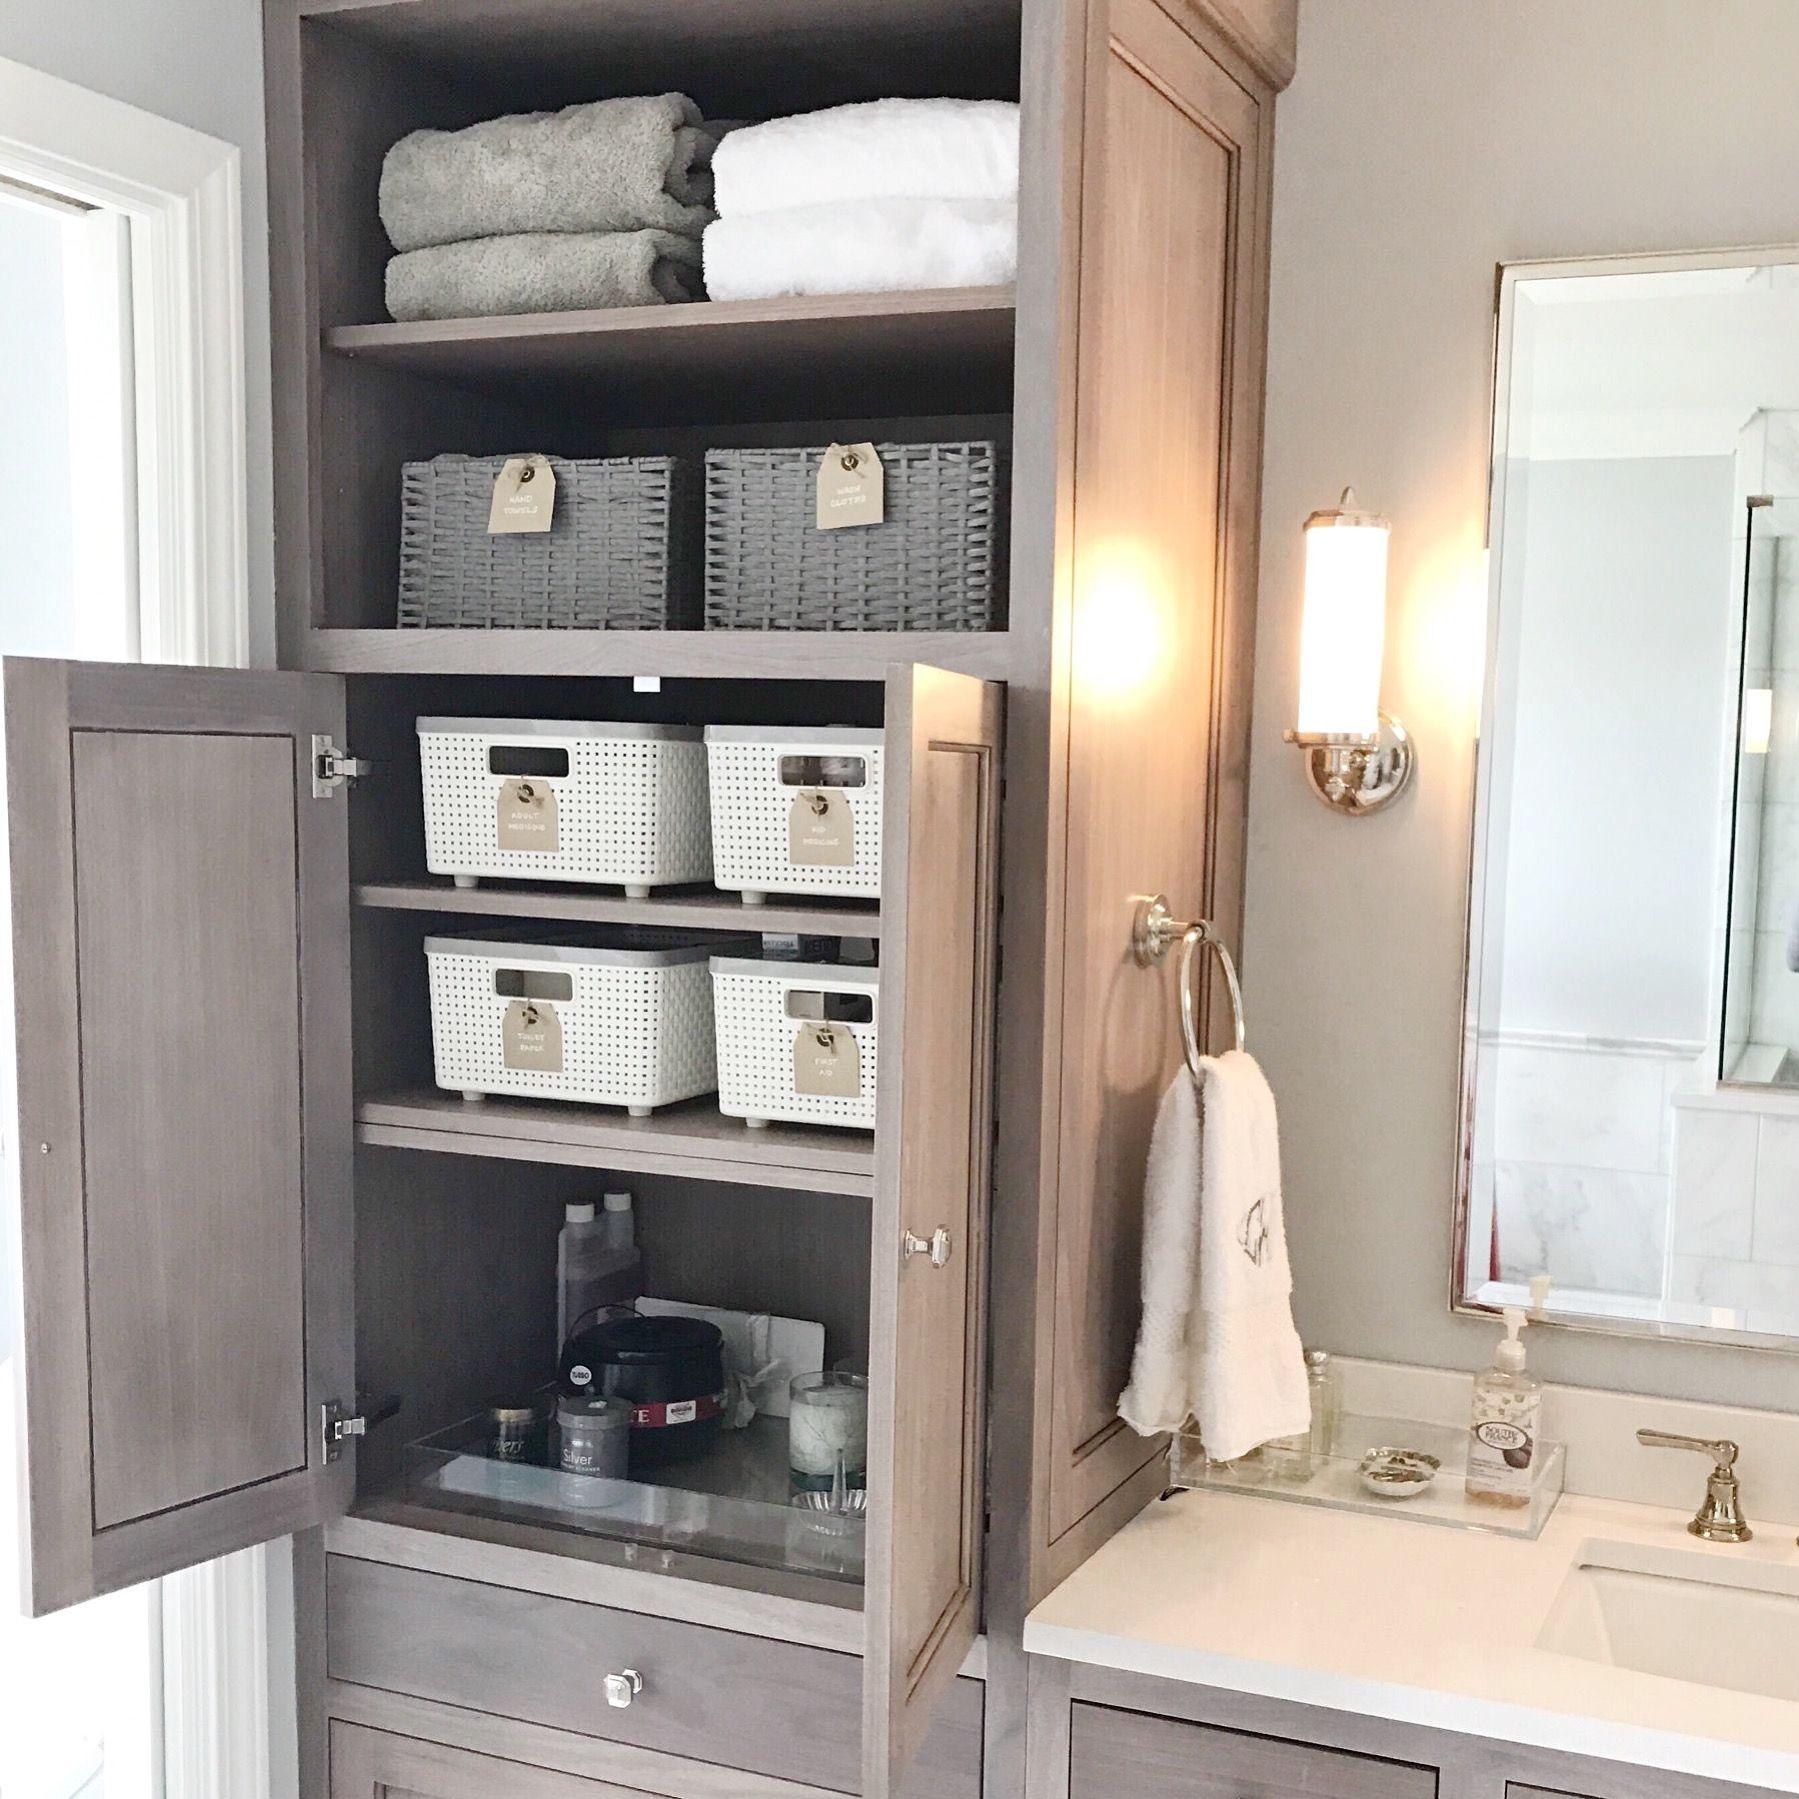 Neat Method Bathrooms Modern Bathrooms White Bathrooms pertaining to size 1799 X 1799